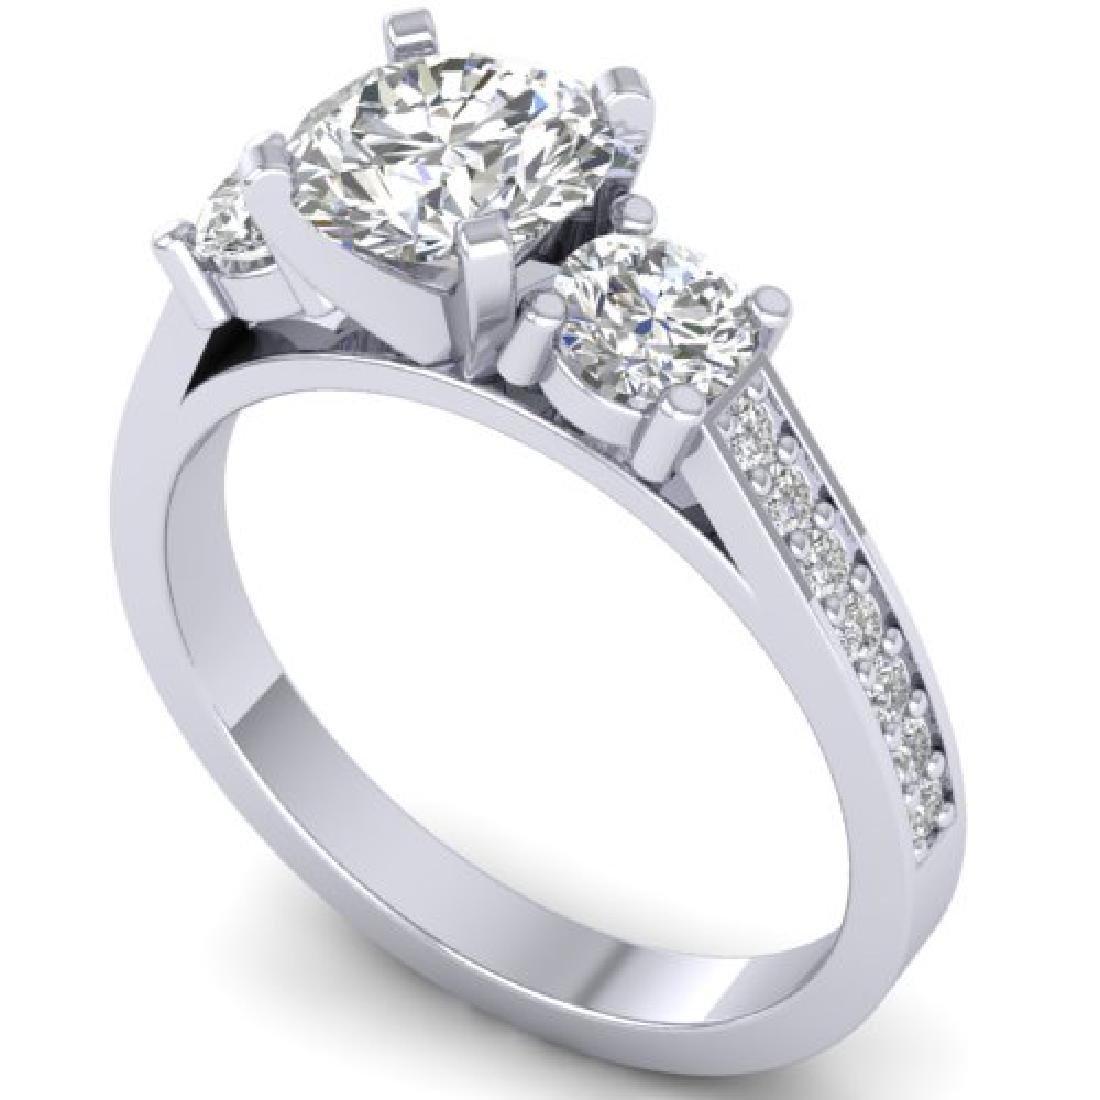 1.75 CTW Certified VS/SI Diamond 3 Stone Ring 18K White - 2